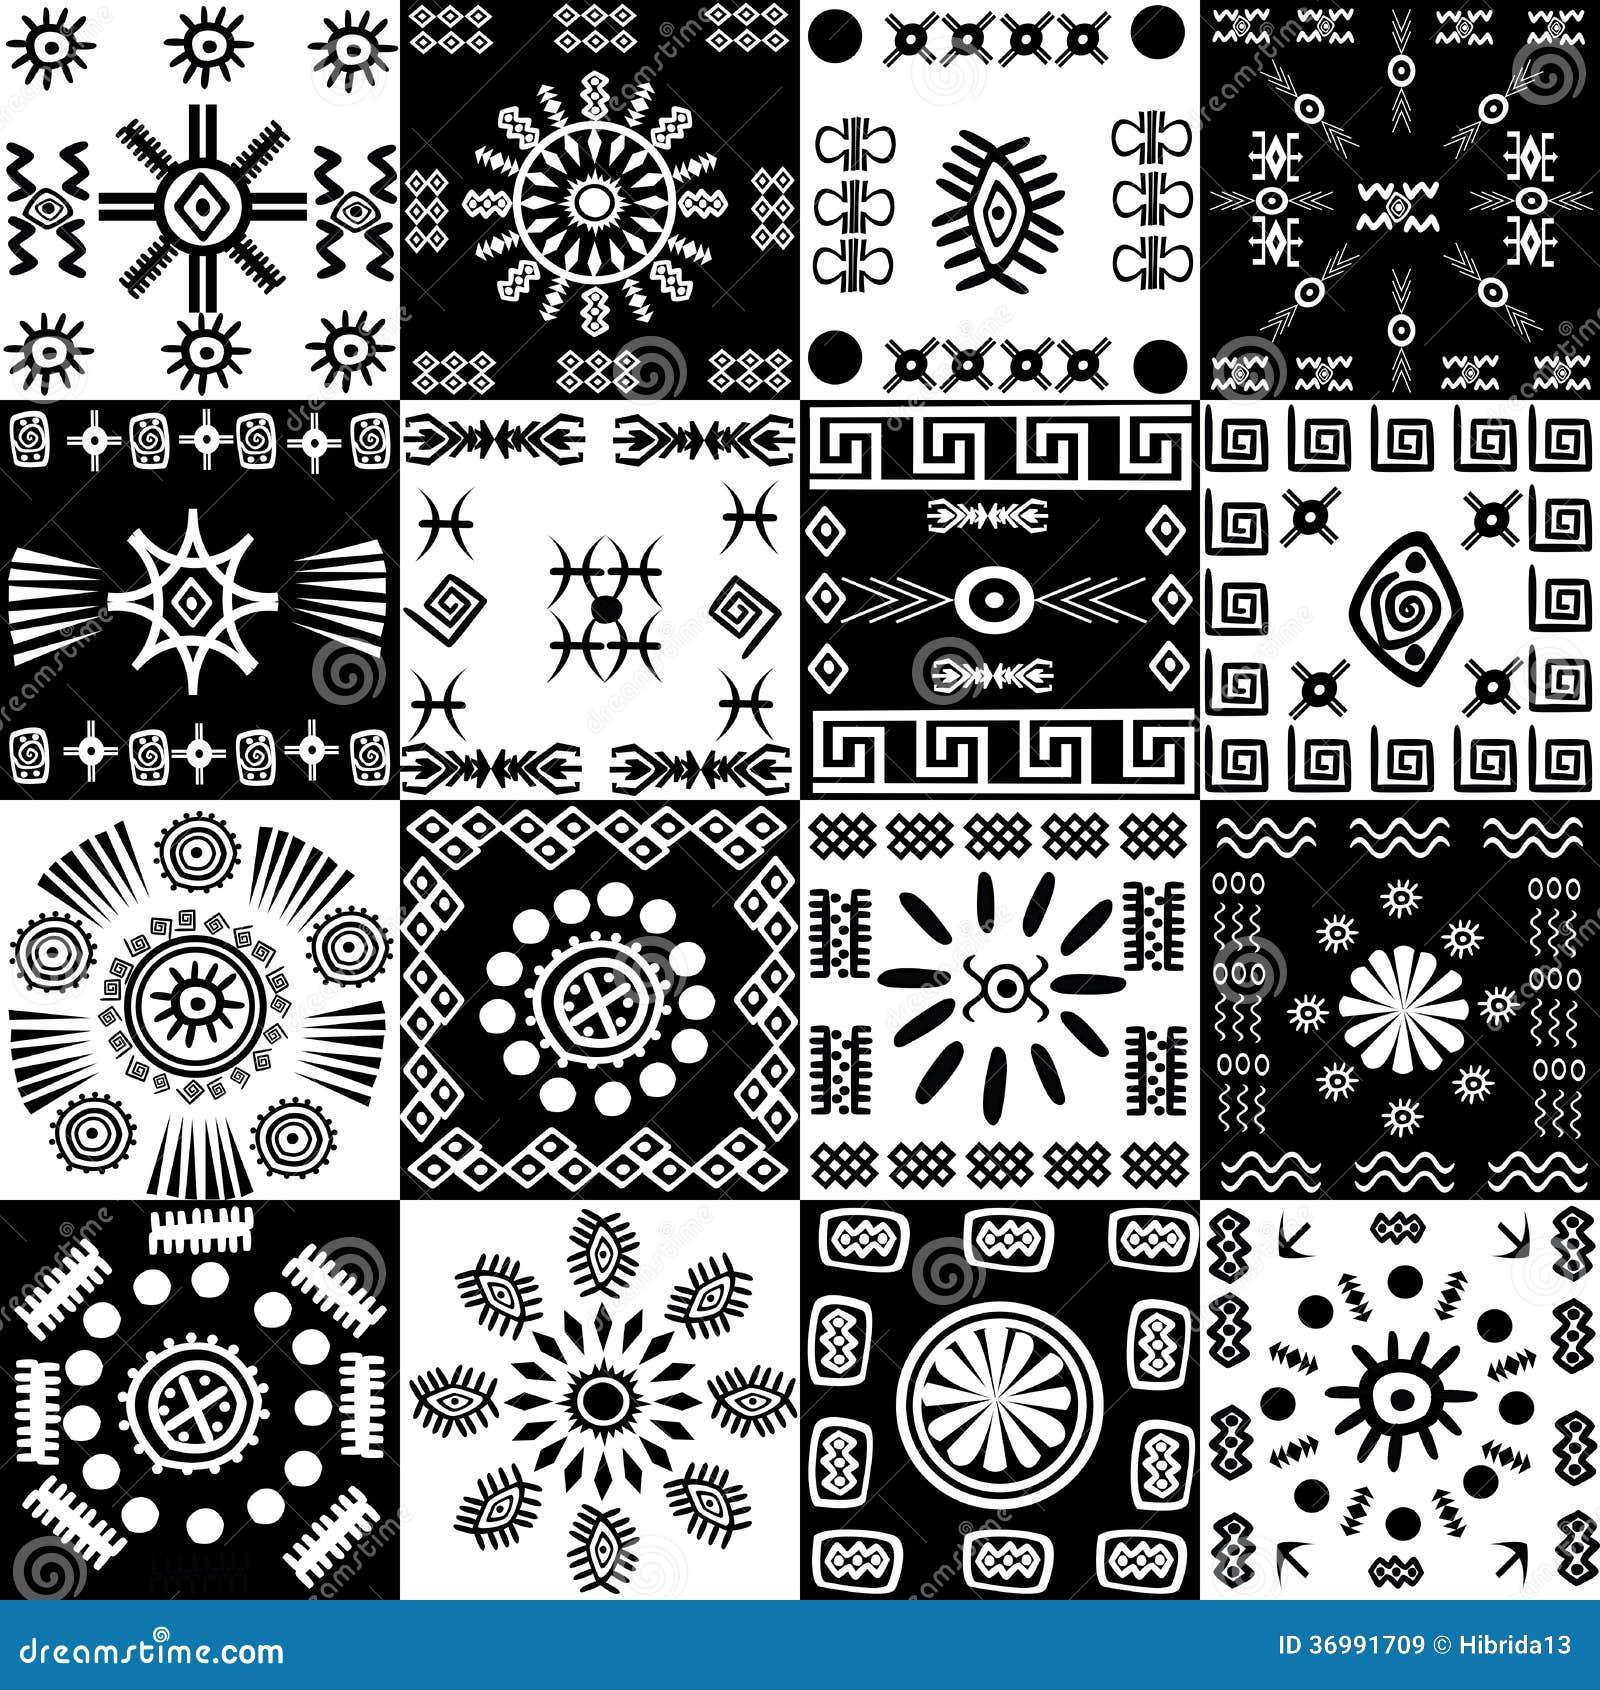 motifs tribal galerie tatouage. Black Bedroom Furniture Sets. Home Design Ideas